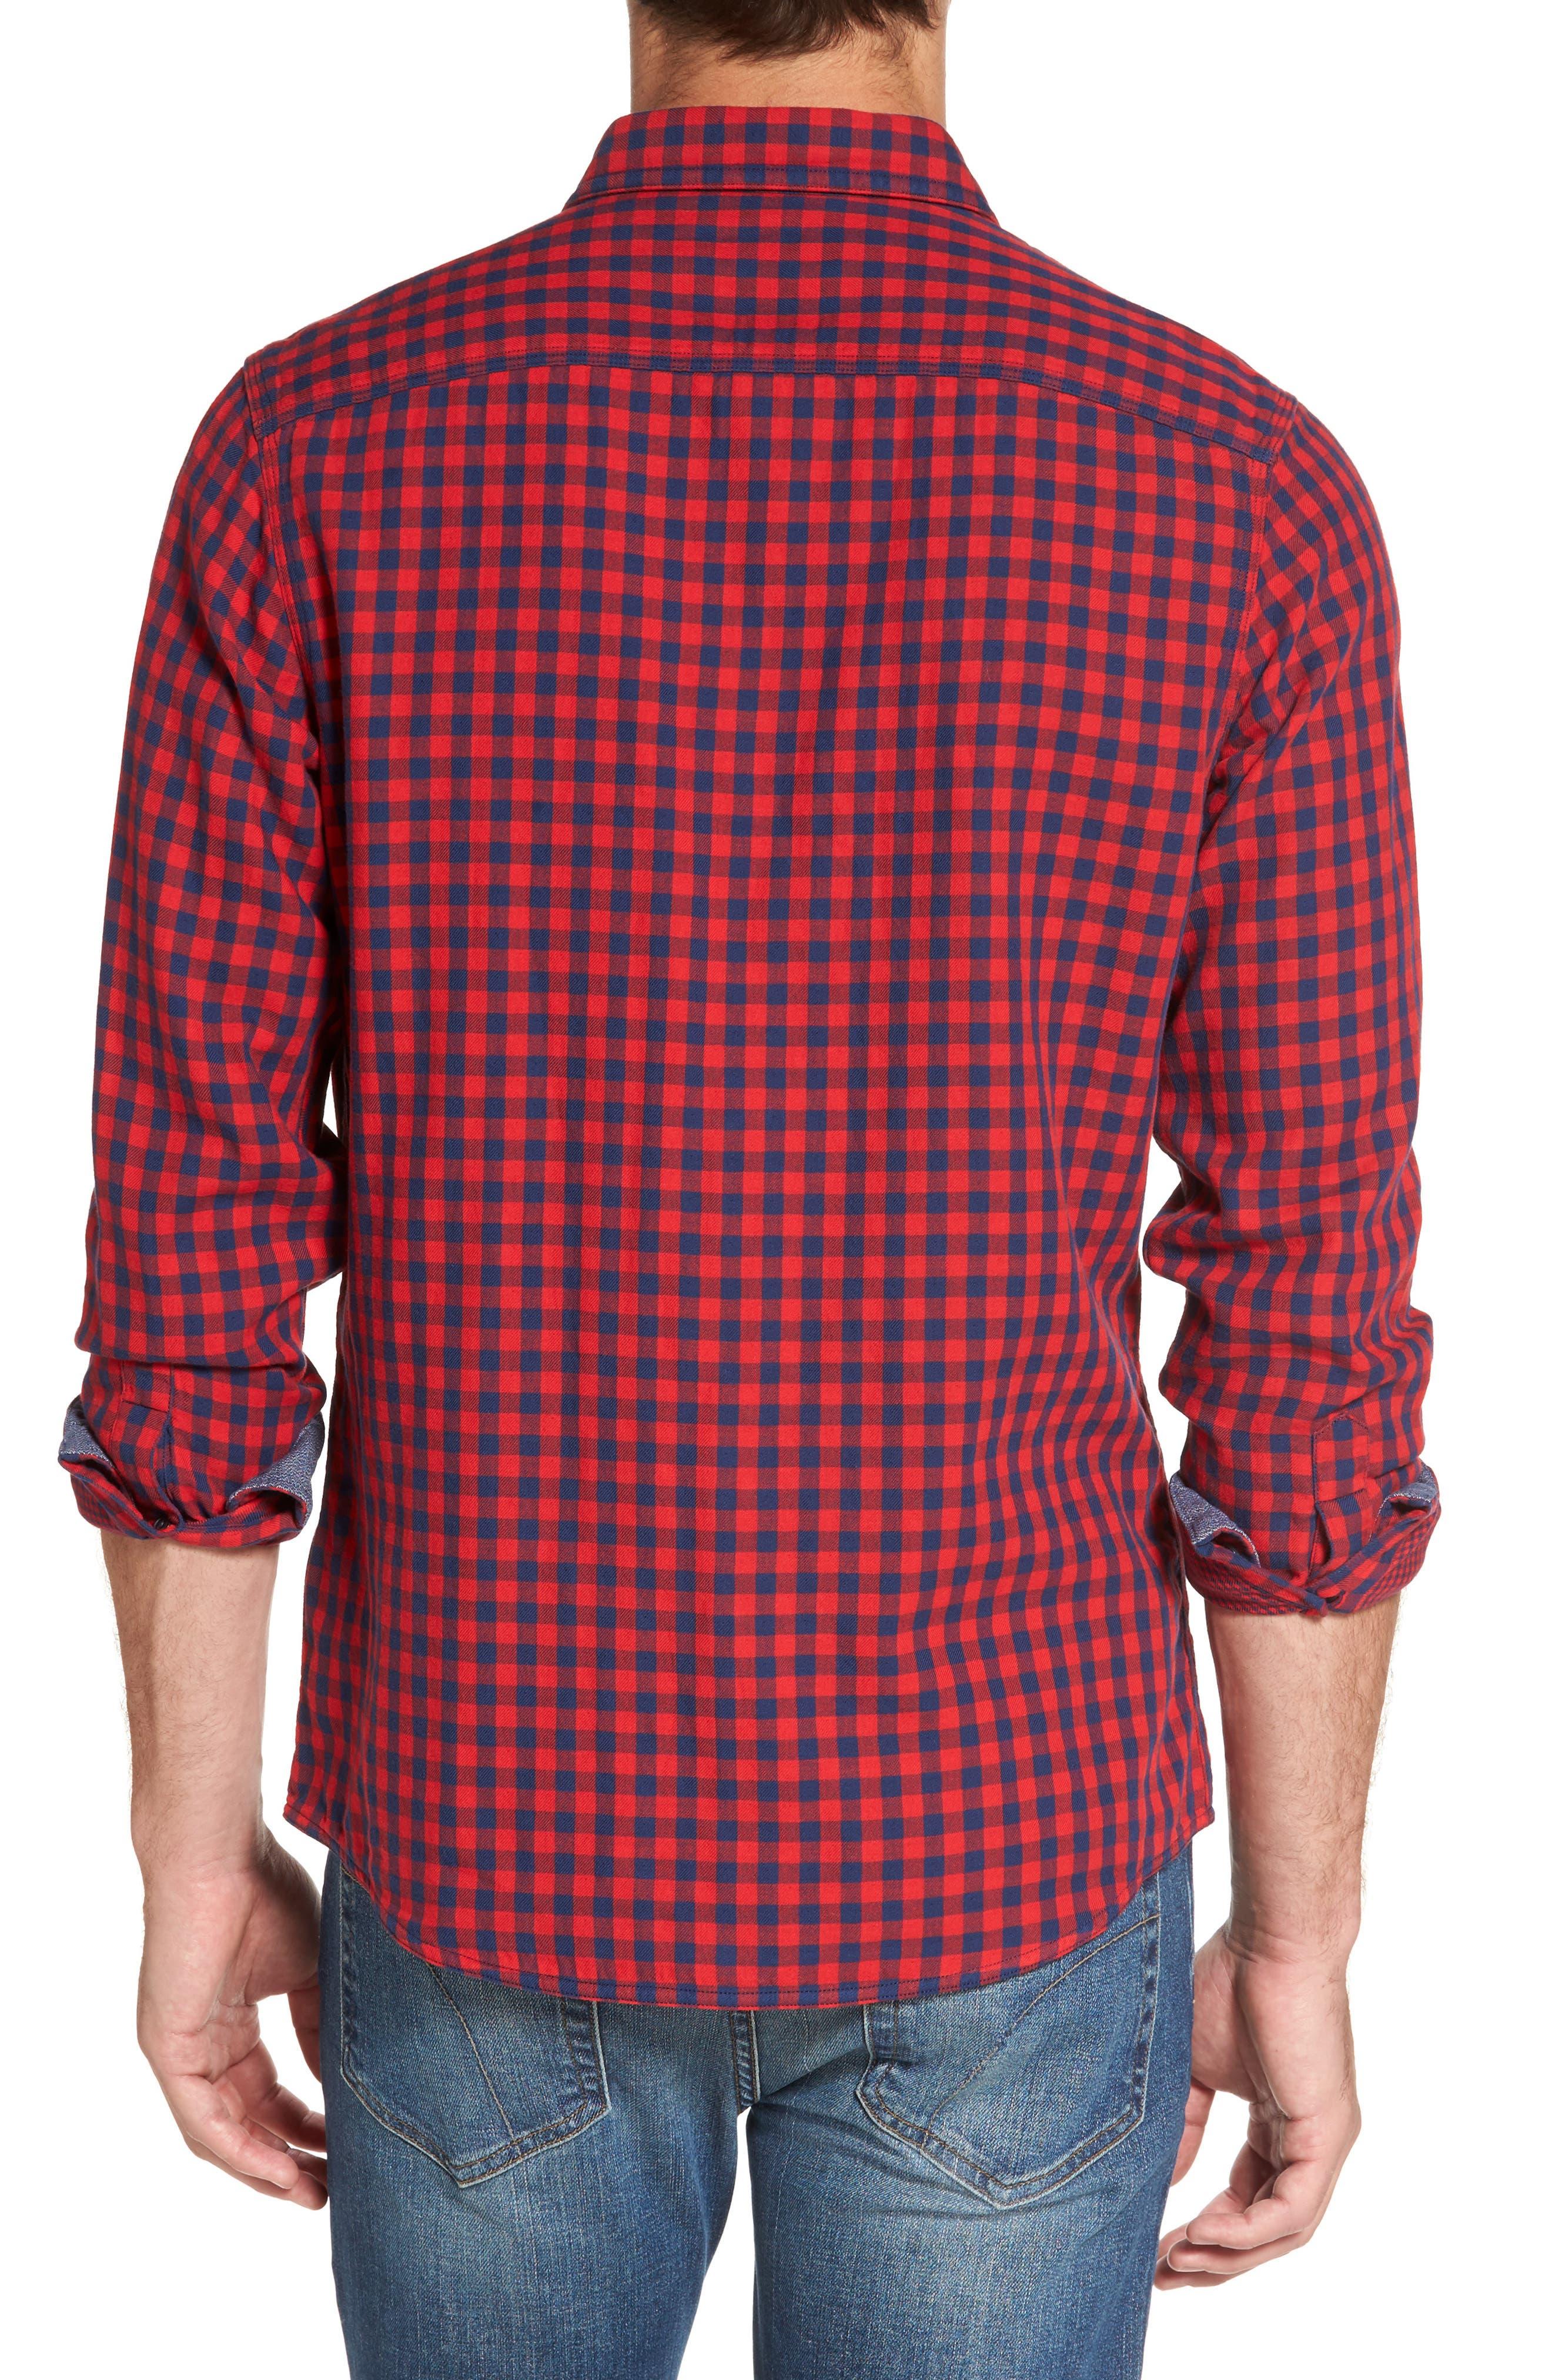 Buffalo Check Trim Fit Sport Shirt,                             Alternate thumbnail 2, color,                             610